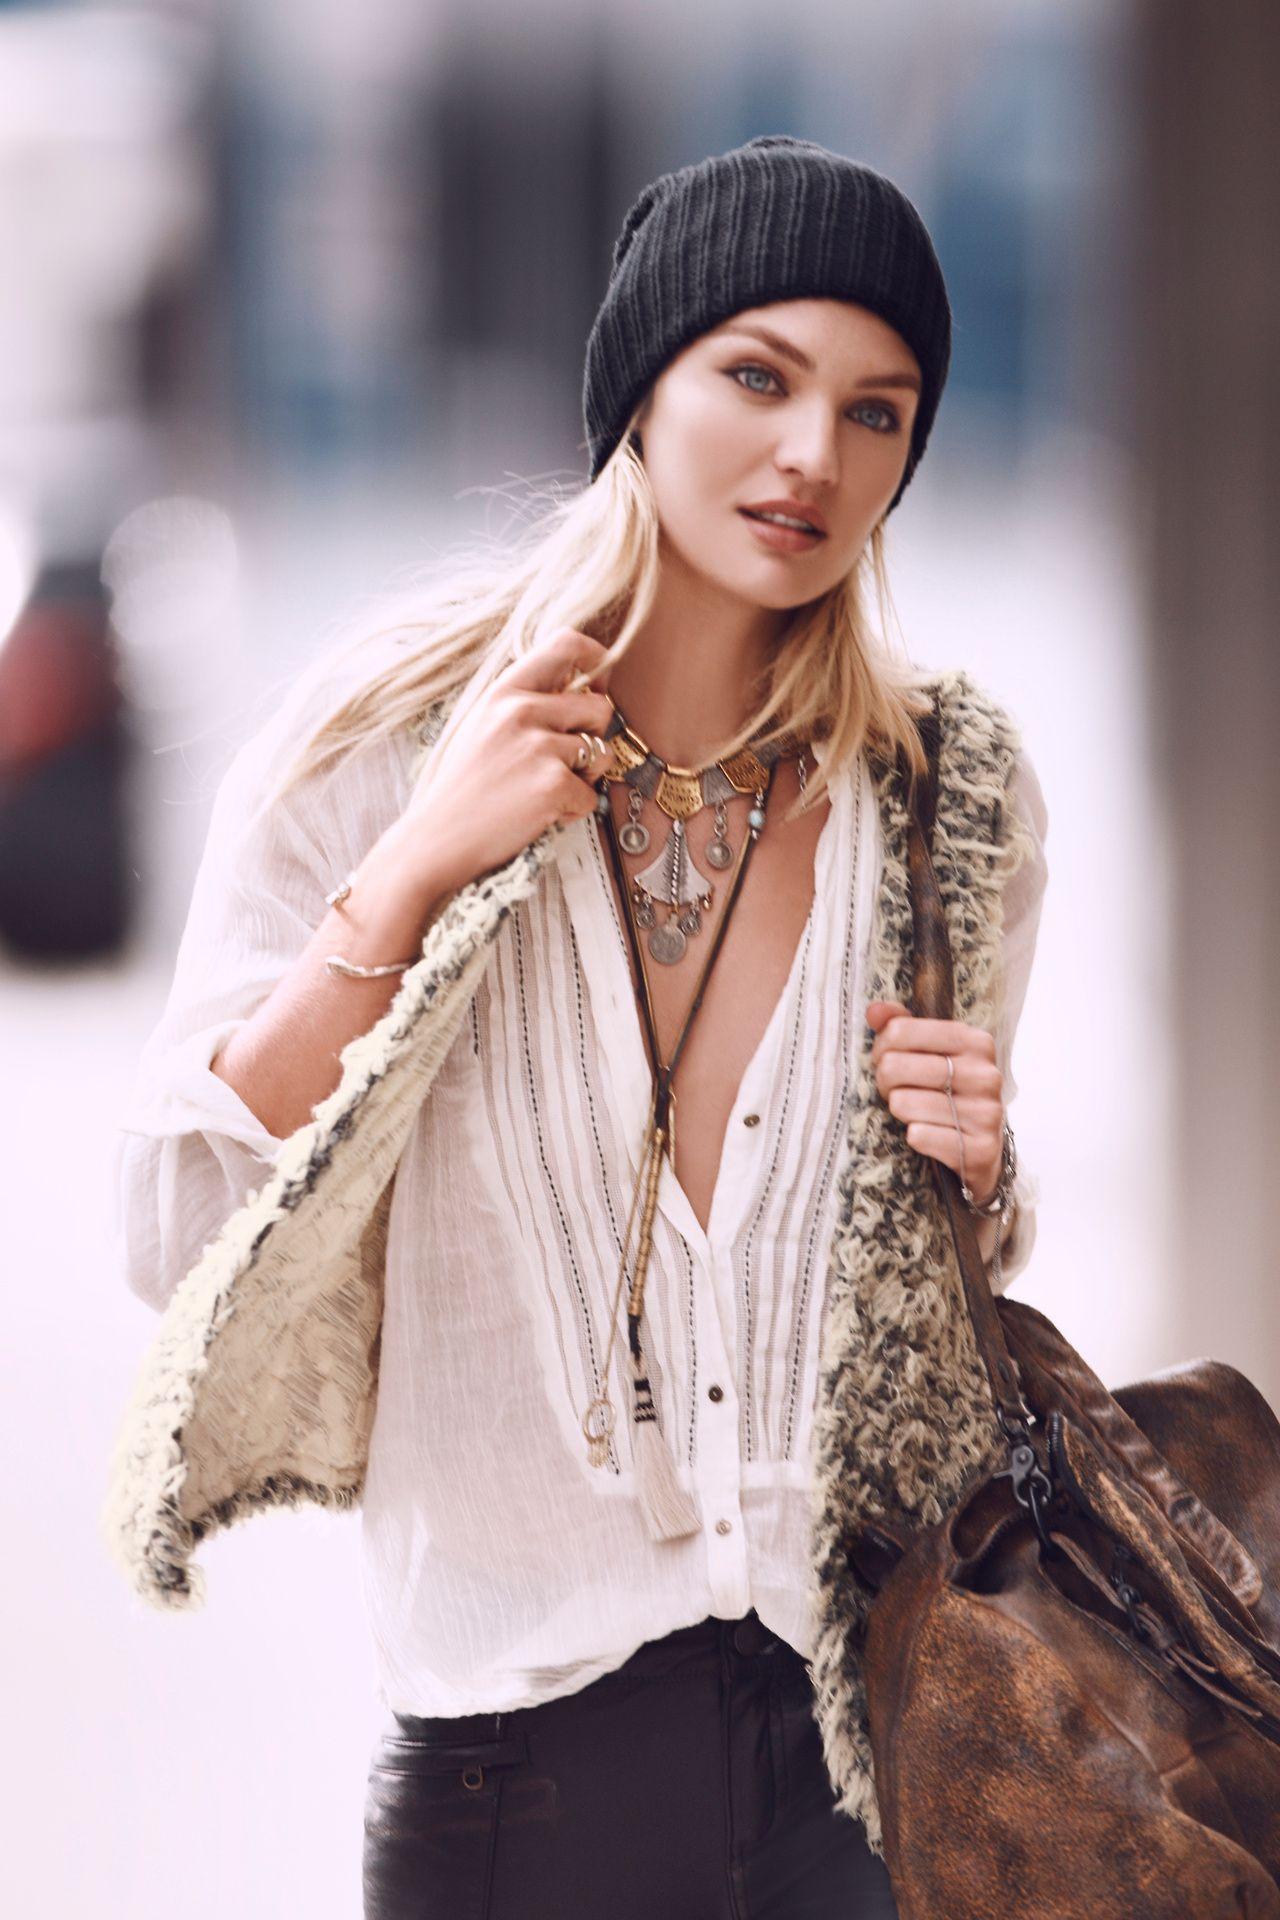 Love her shirt, vest, necklace, & bag! Great Ensemble